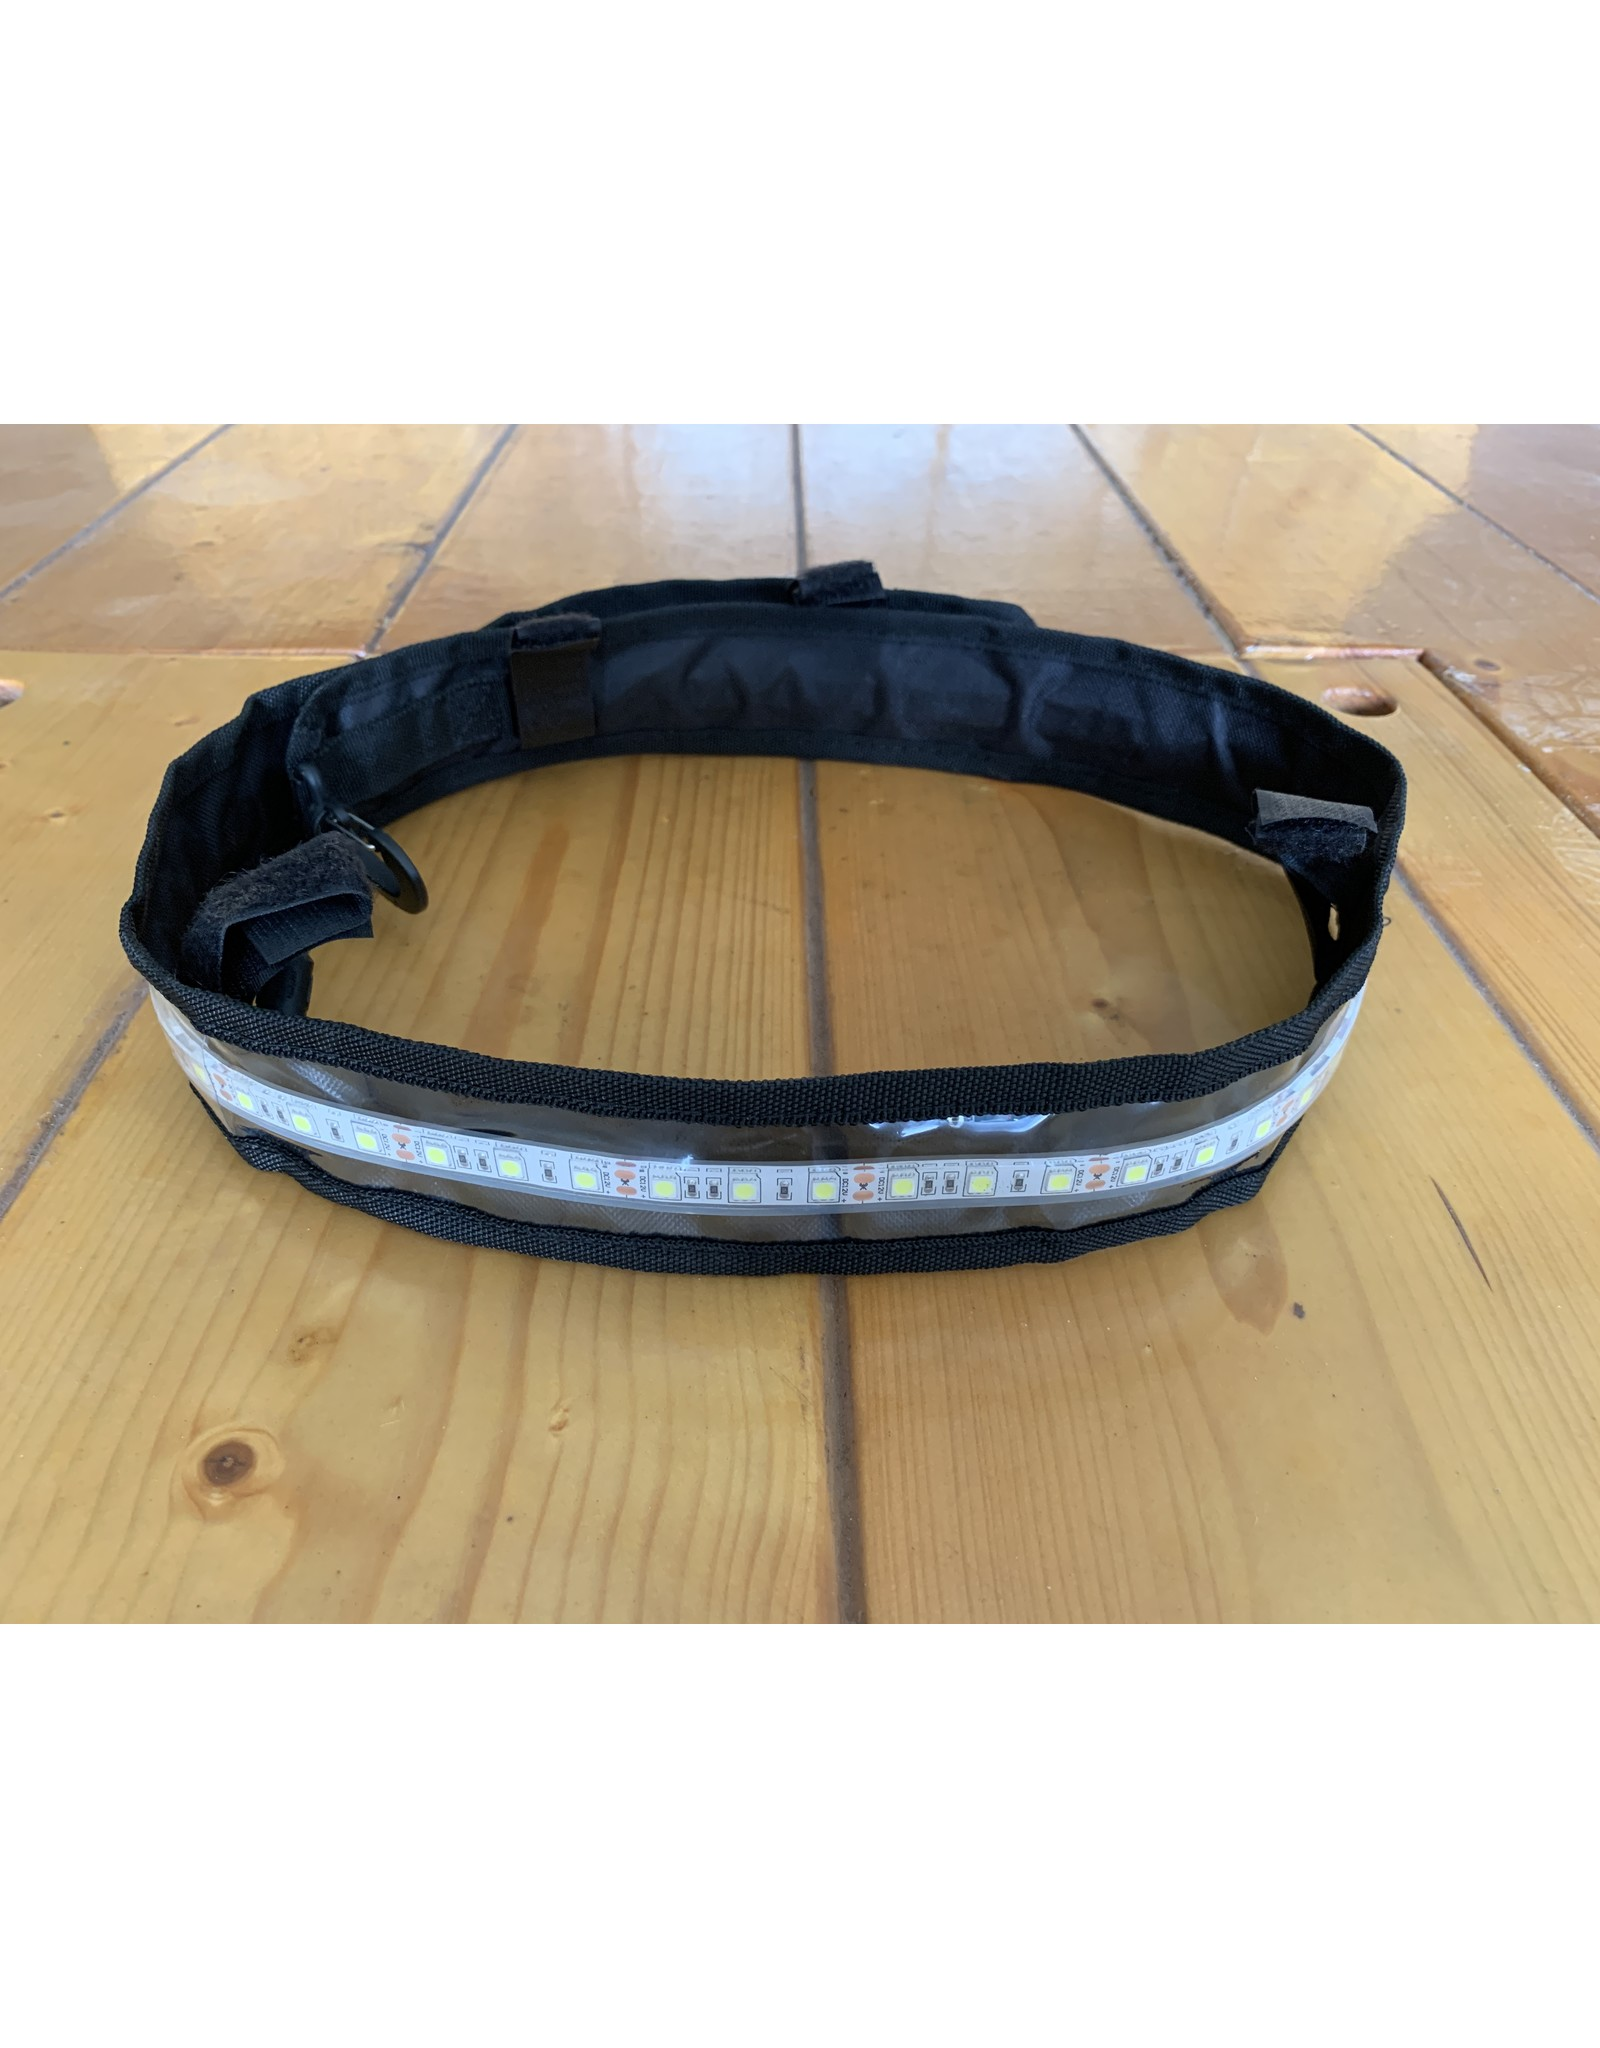 LED-Strip Dachzelt / Markise / Zelt